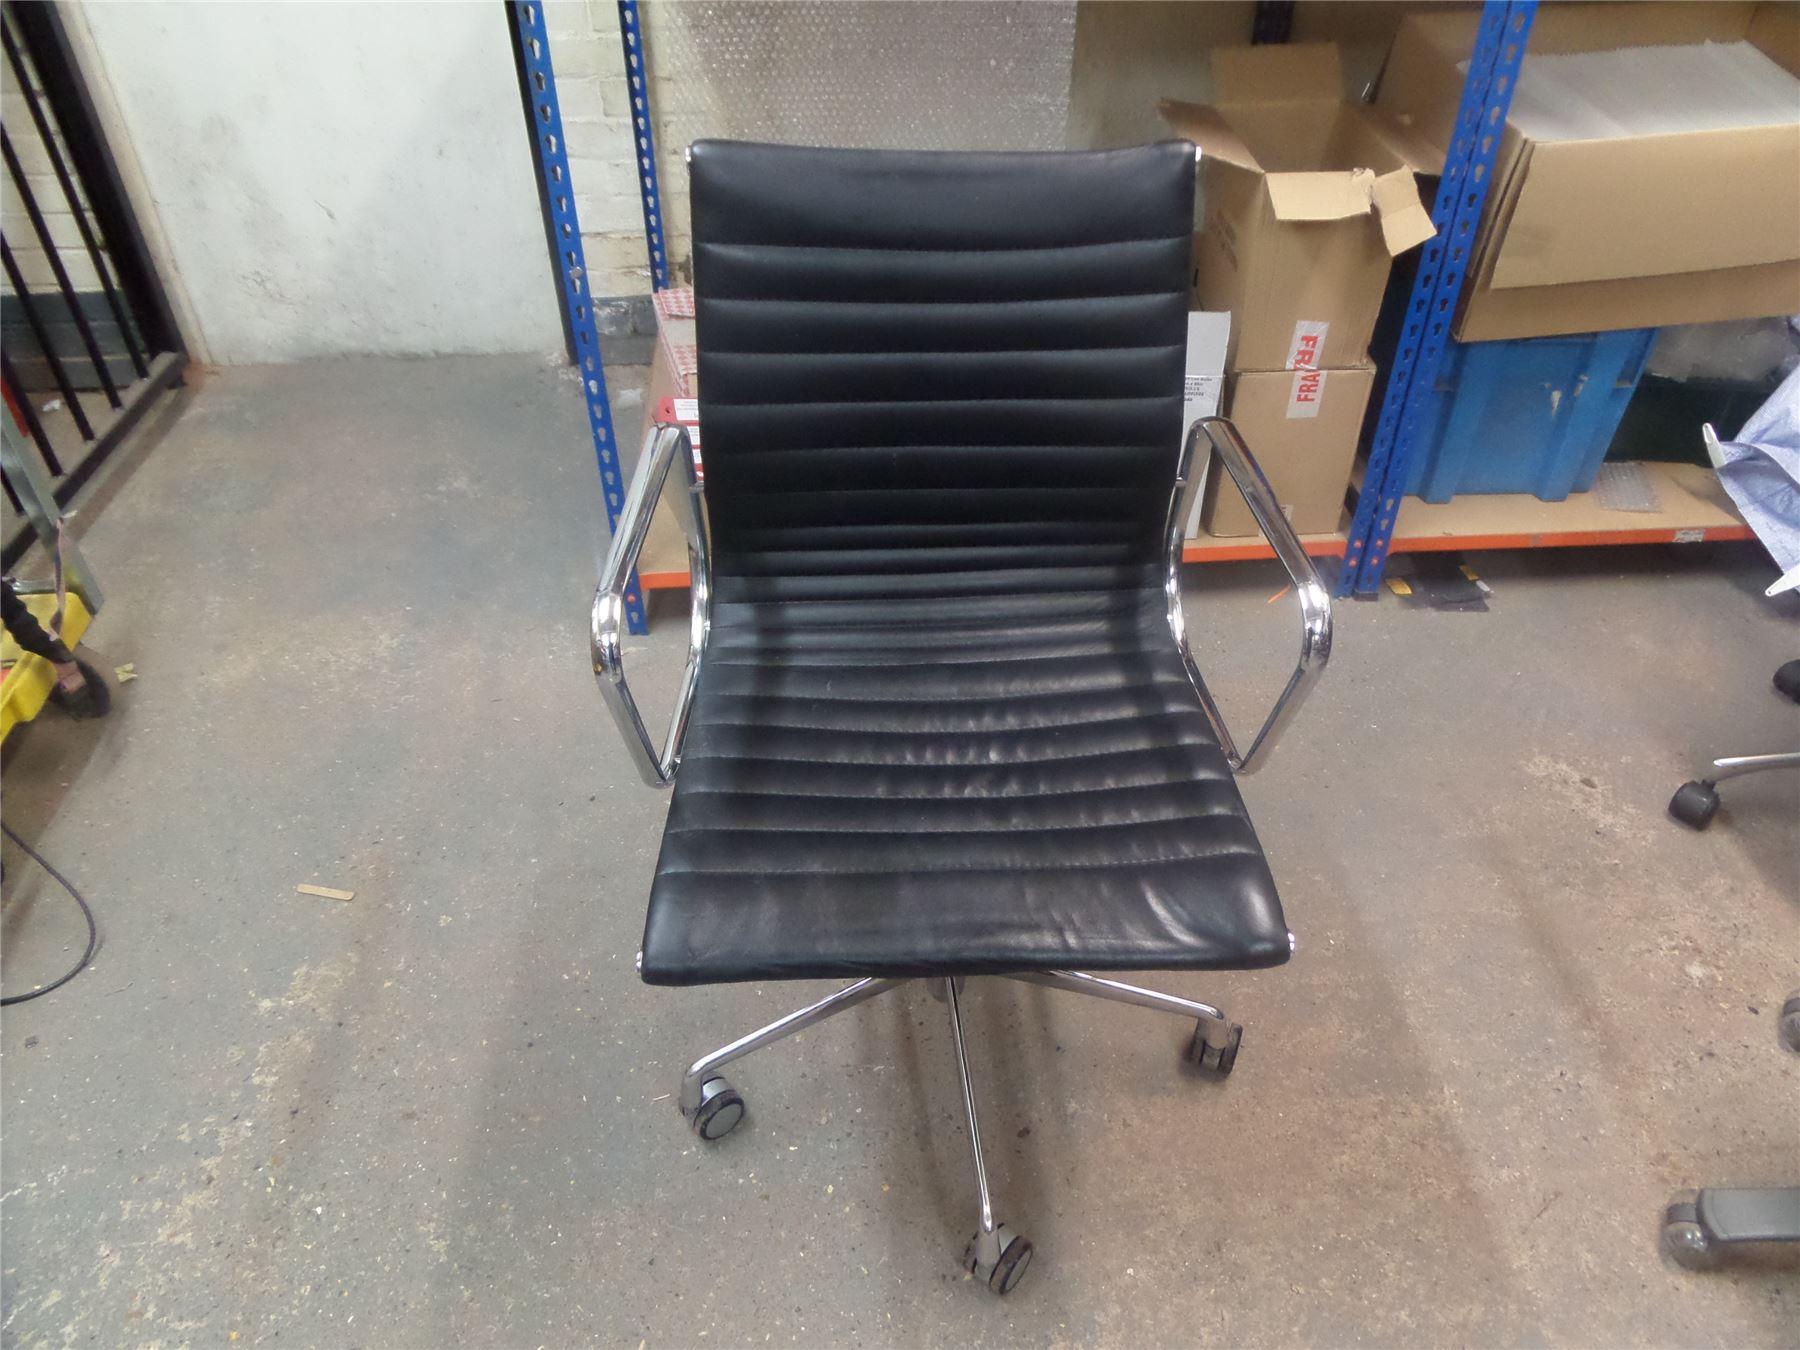 Eames aluminium group ea 117 style chair black leather for Eames ea 117 nachbau